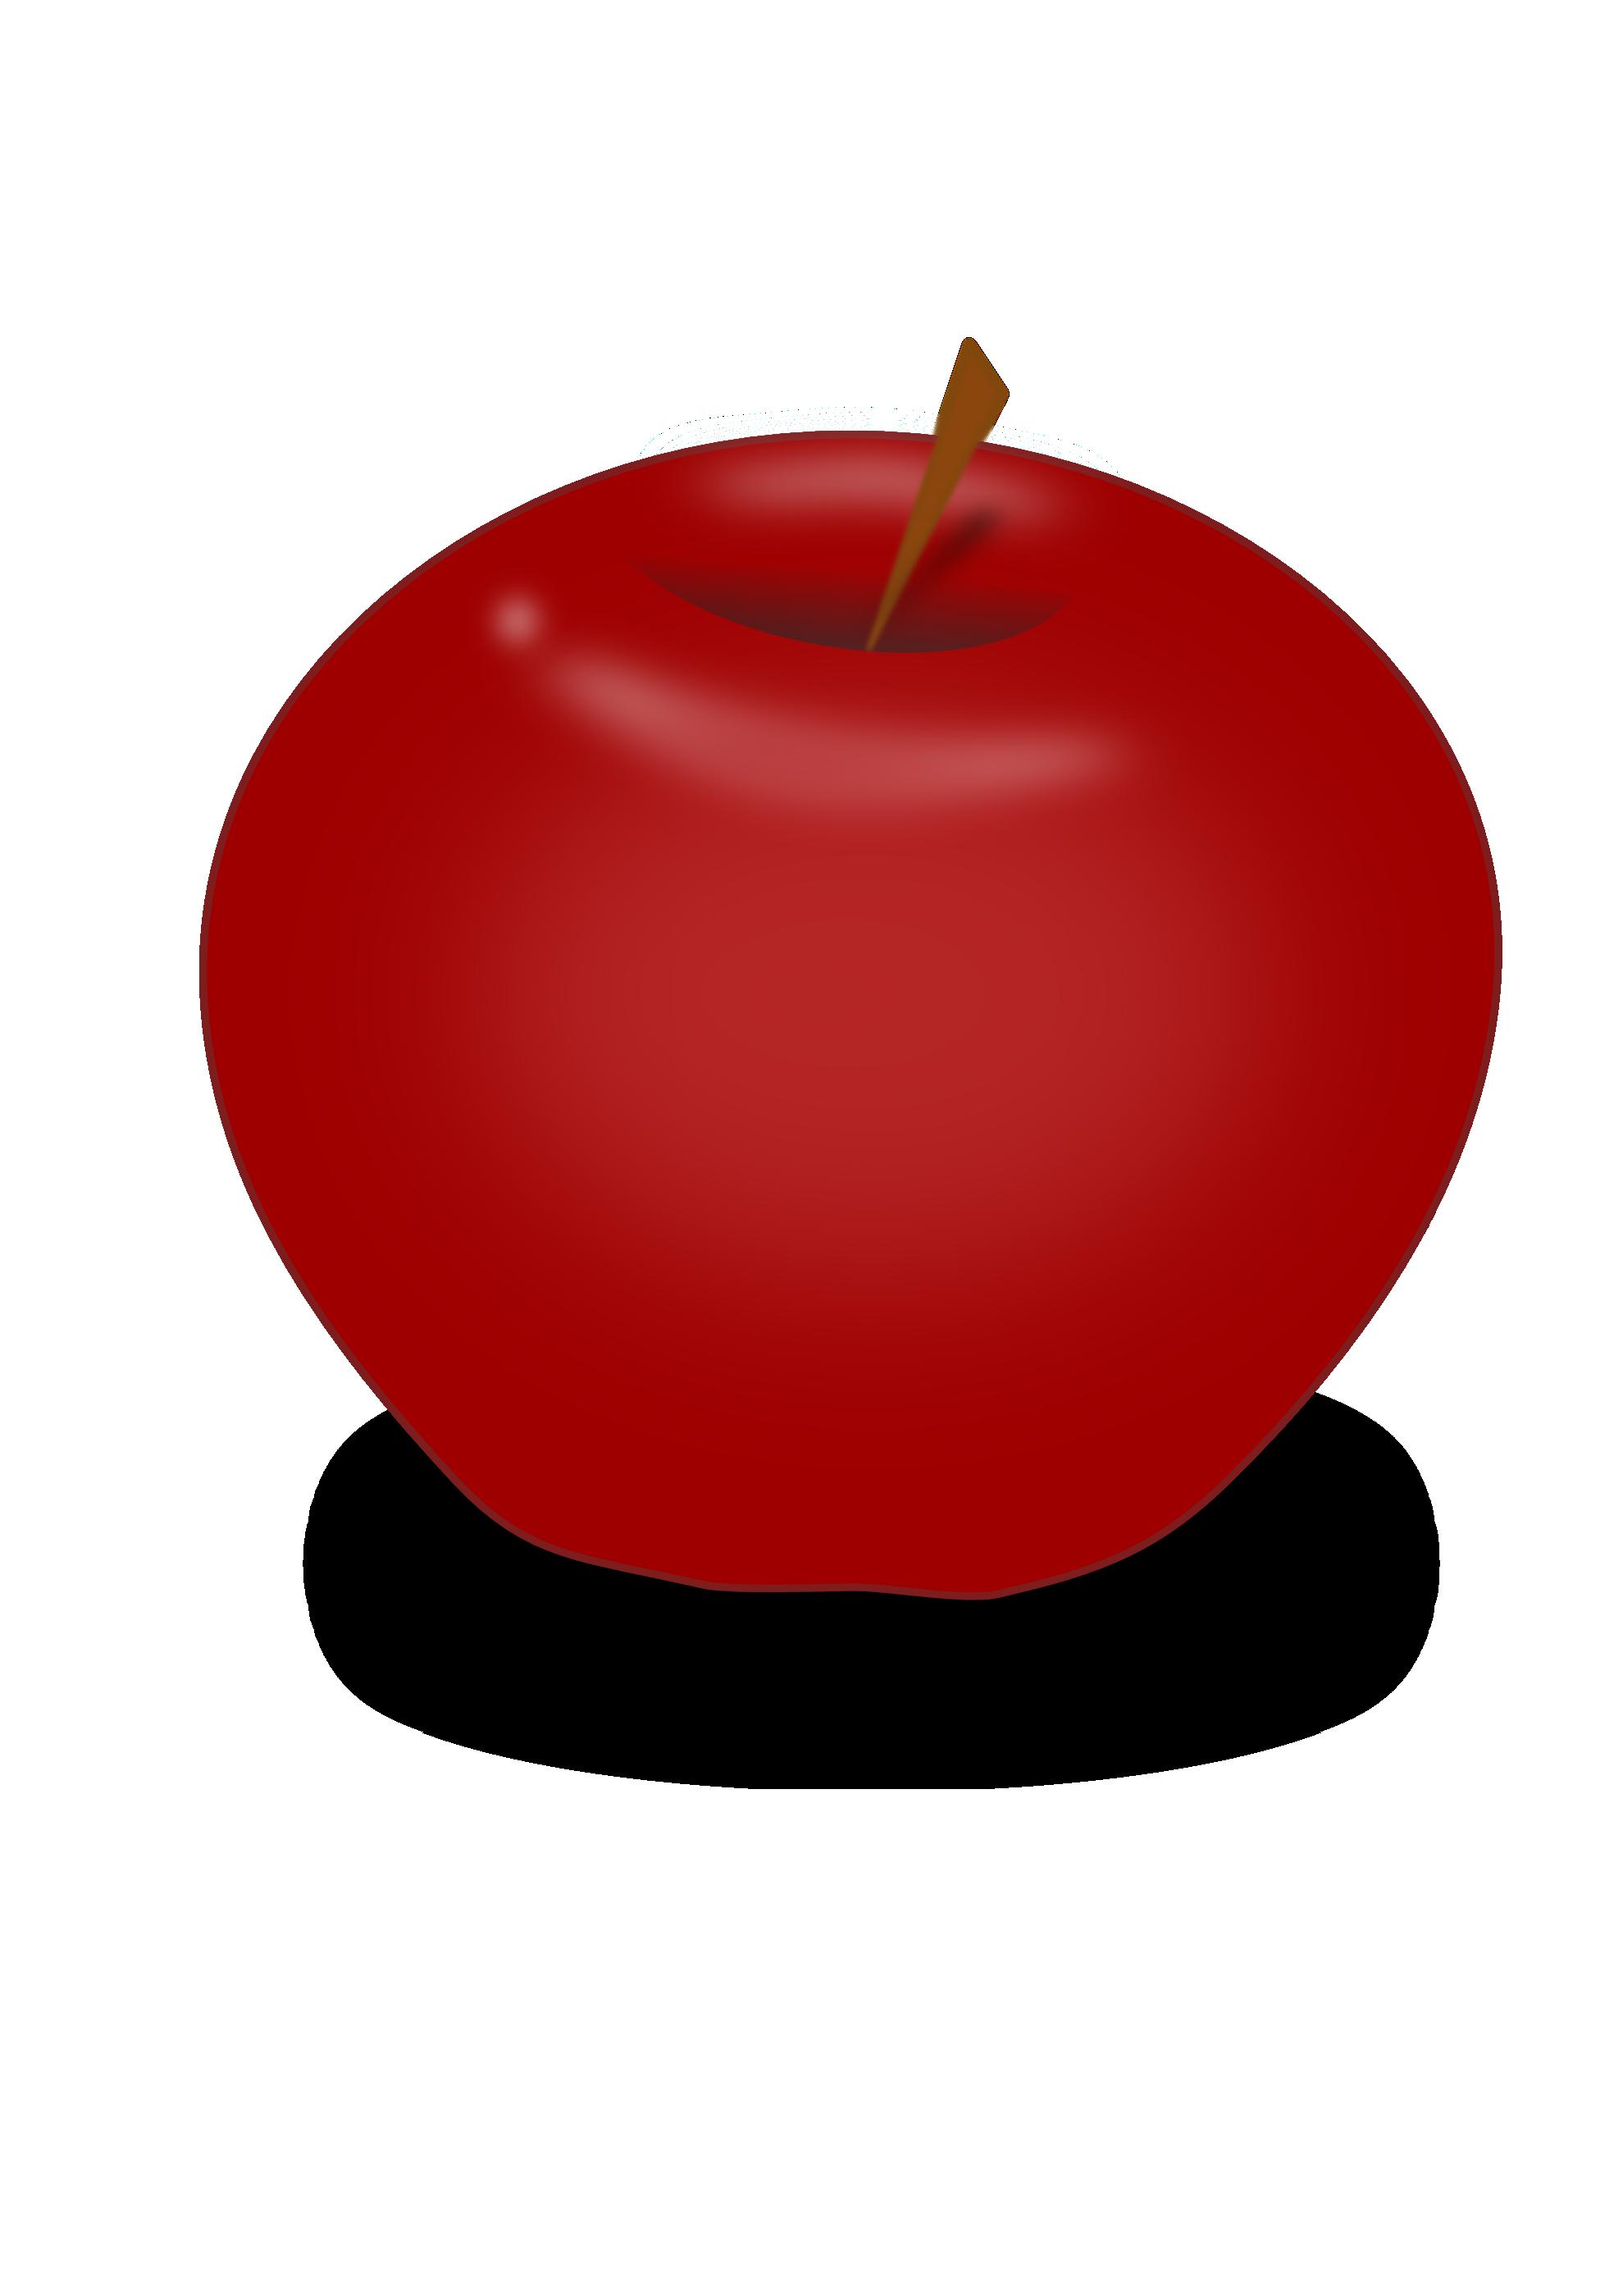 Apple no stem free clipart.